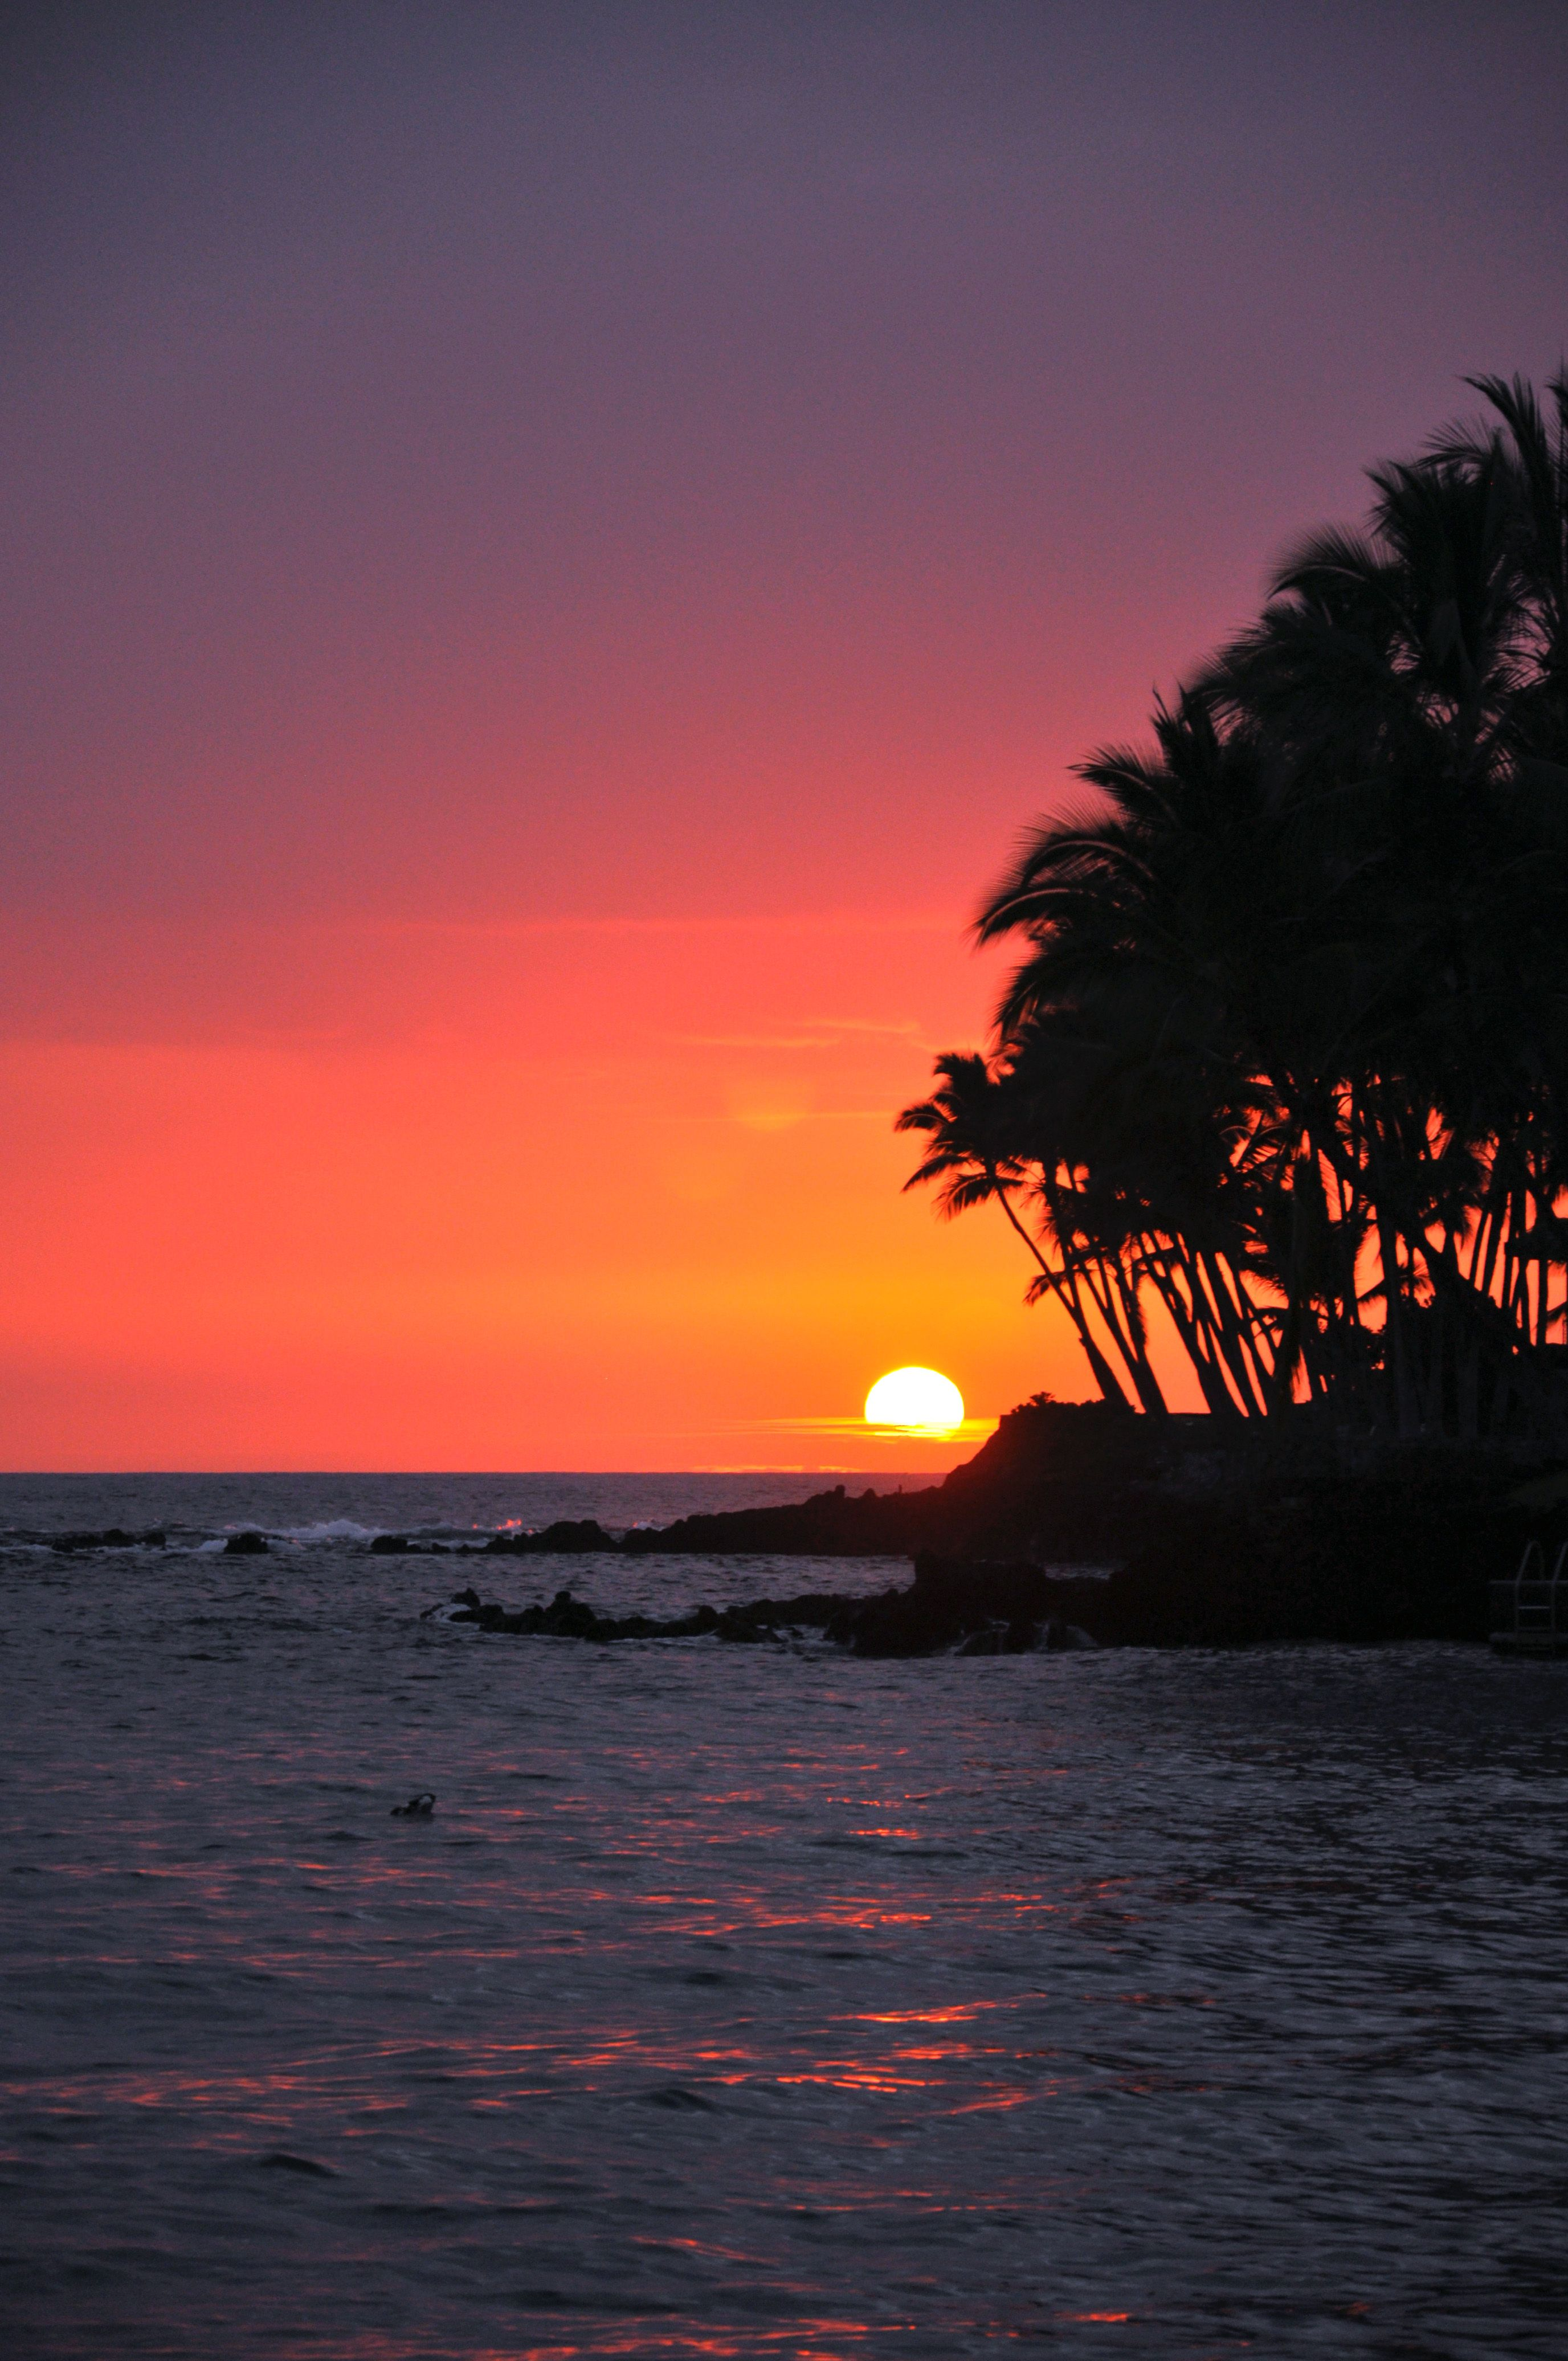 Big Island Sunset, Hawaii Sunset iphone wallpaper